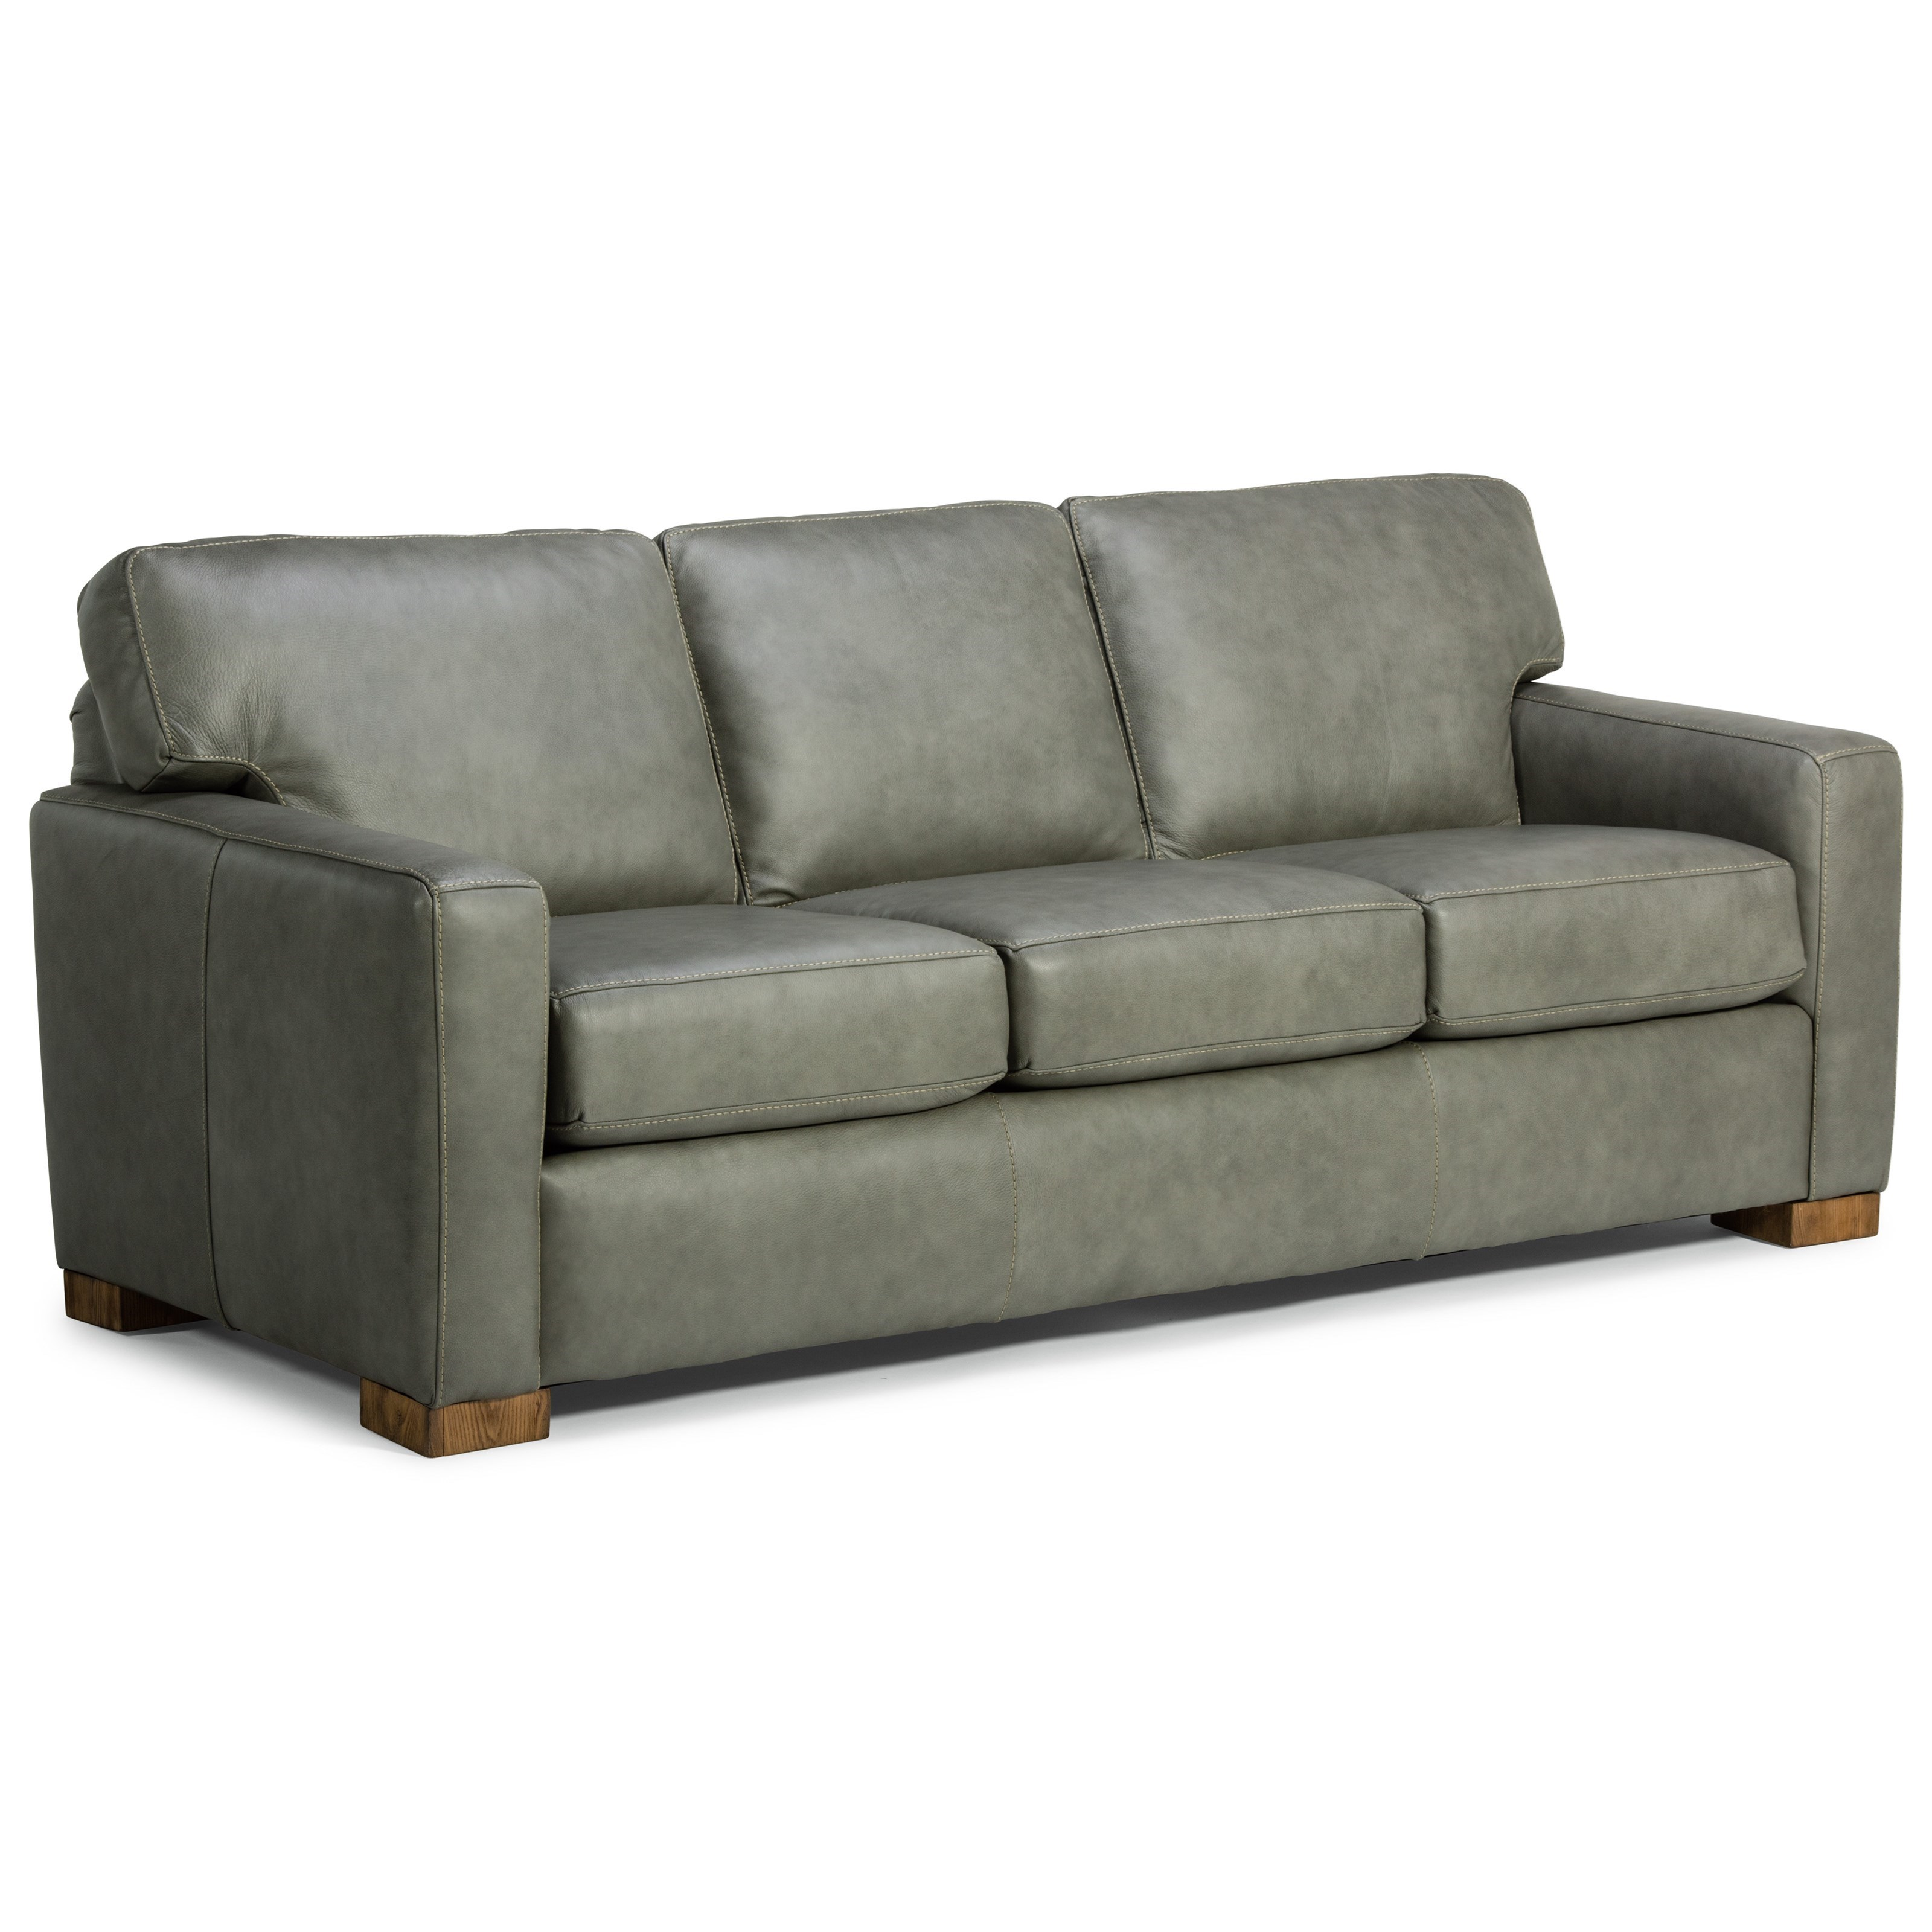 Bryant Sofa by Flexsteel at Jordan's Home Furnishings